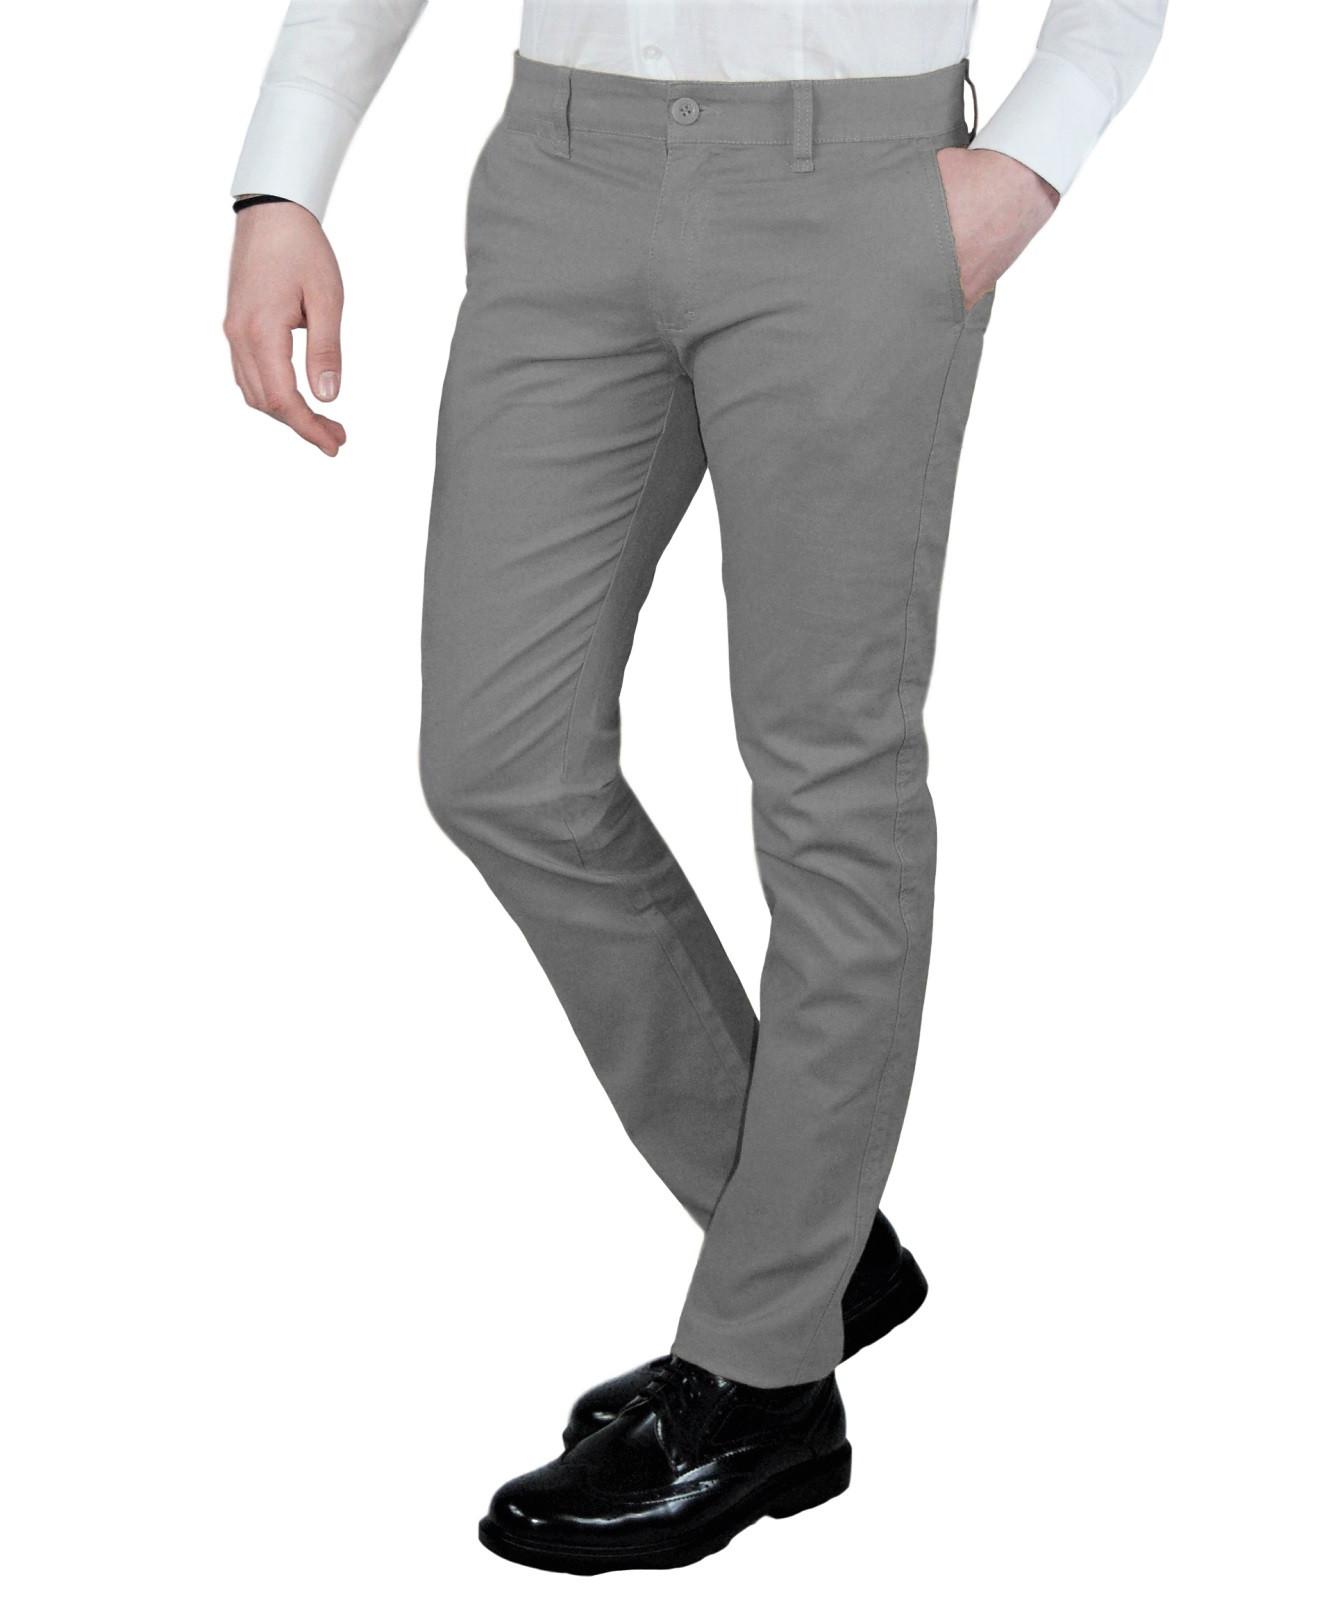 Pantalone-Uomo-Chino-Slim-fit-Primaverile-tasca-america-Bianco-Grigio-Senape-Bei miniatura 18